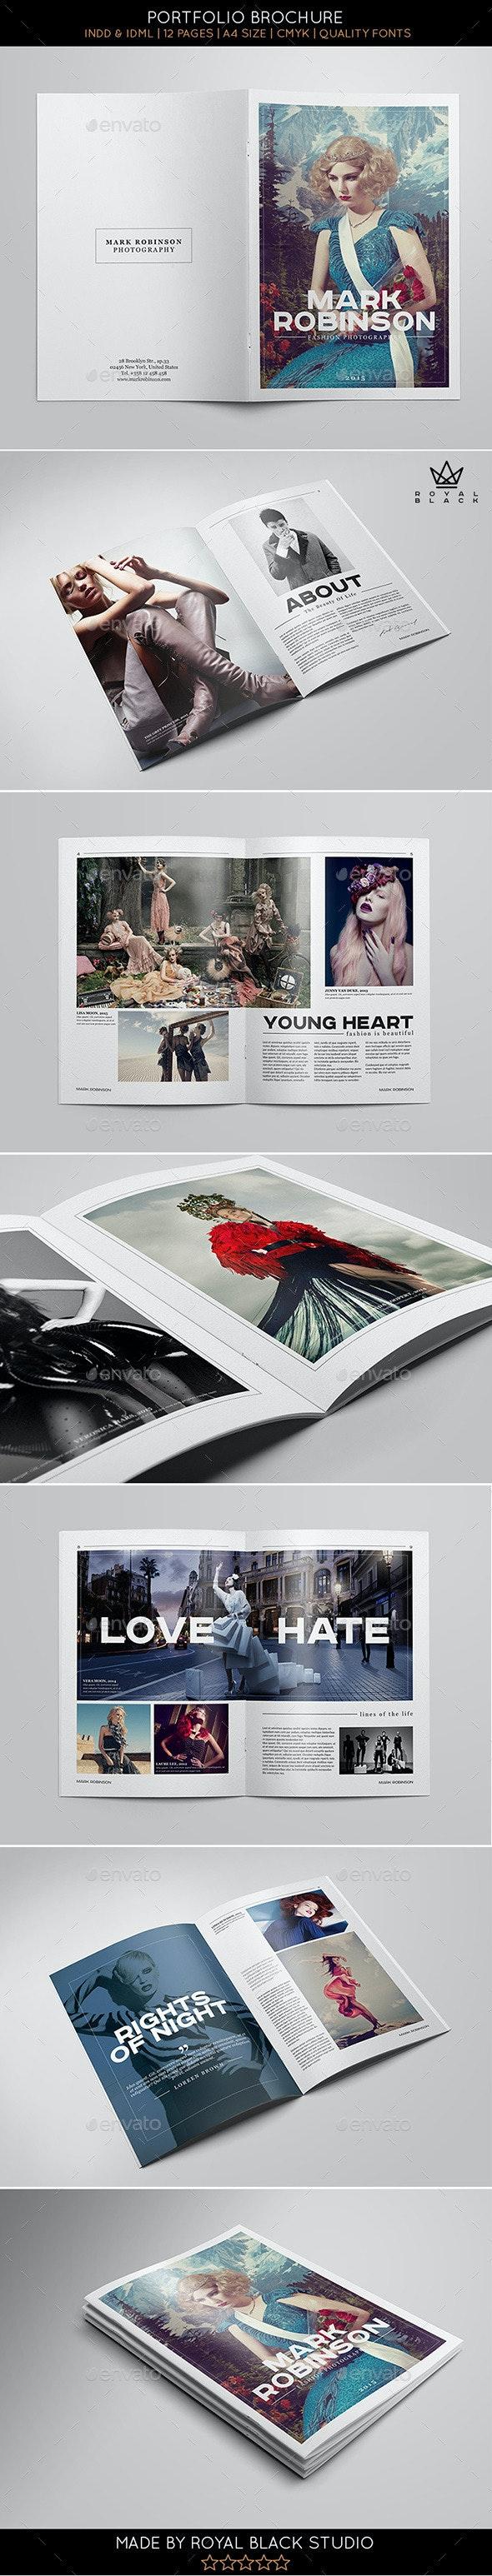 Portfolio Brochure Vol.6 - Portfolio Brochures